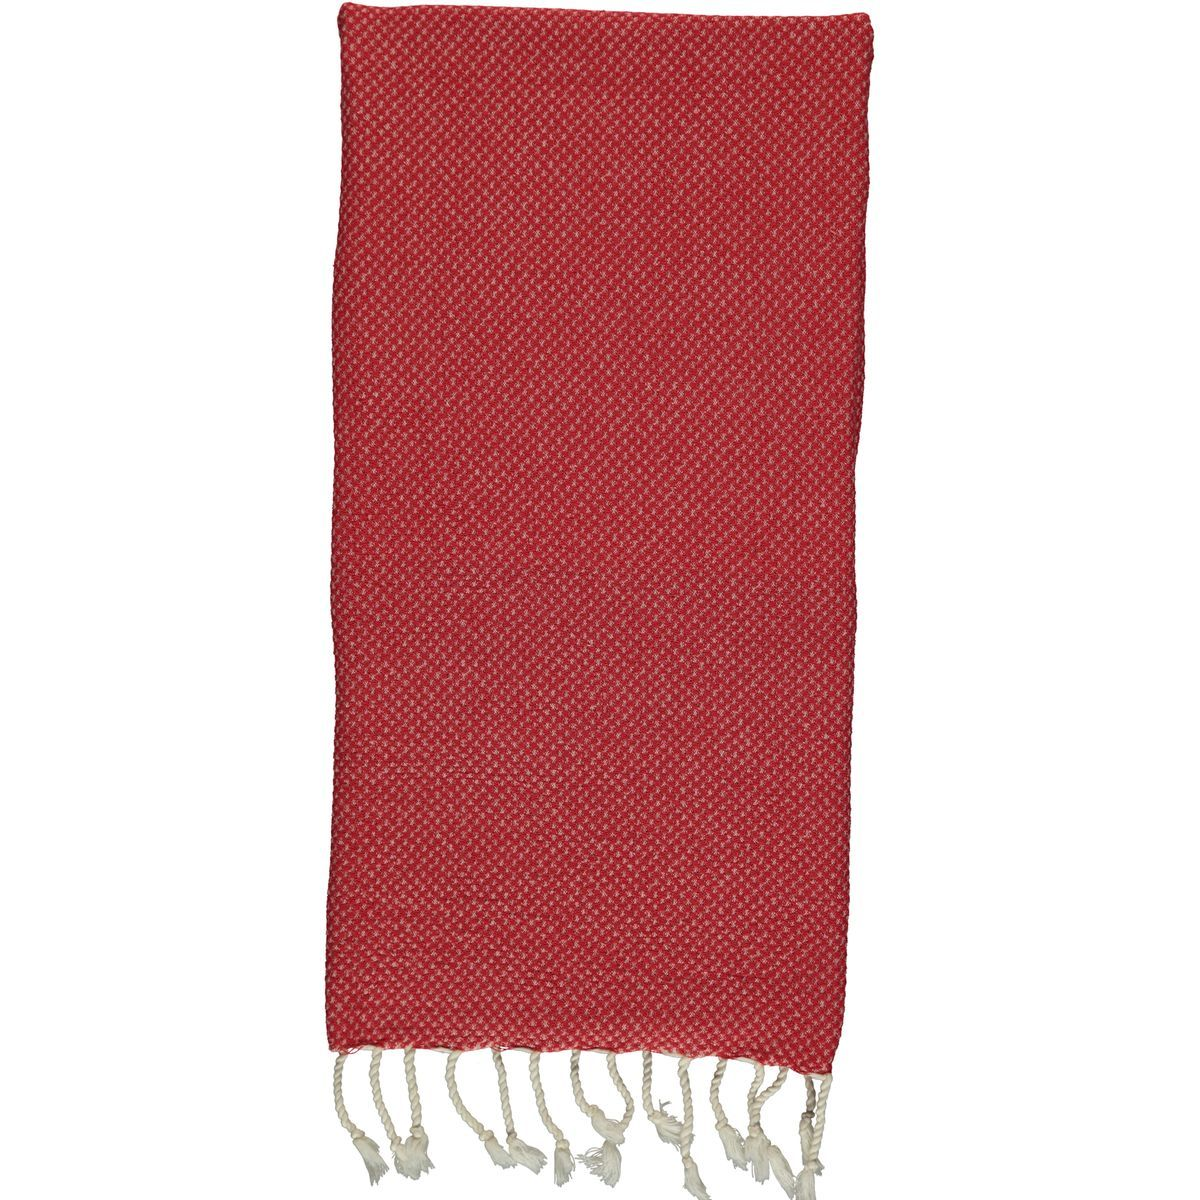 Peştemal Dama - Kırmızı